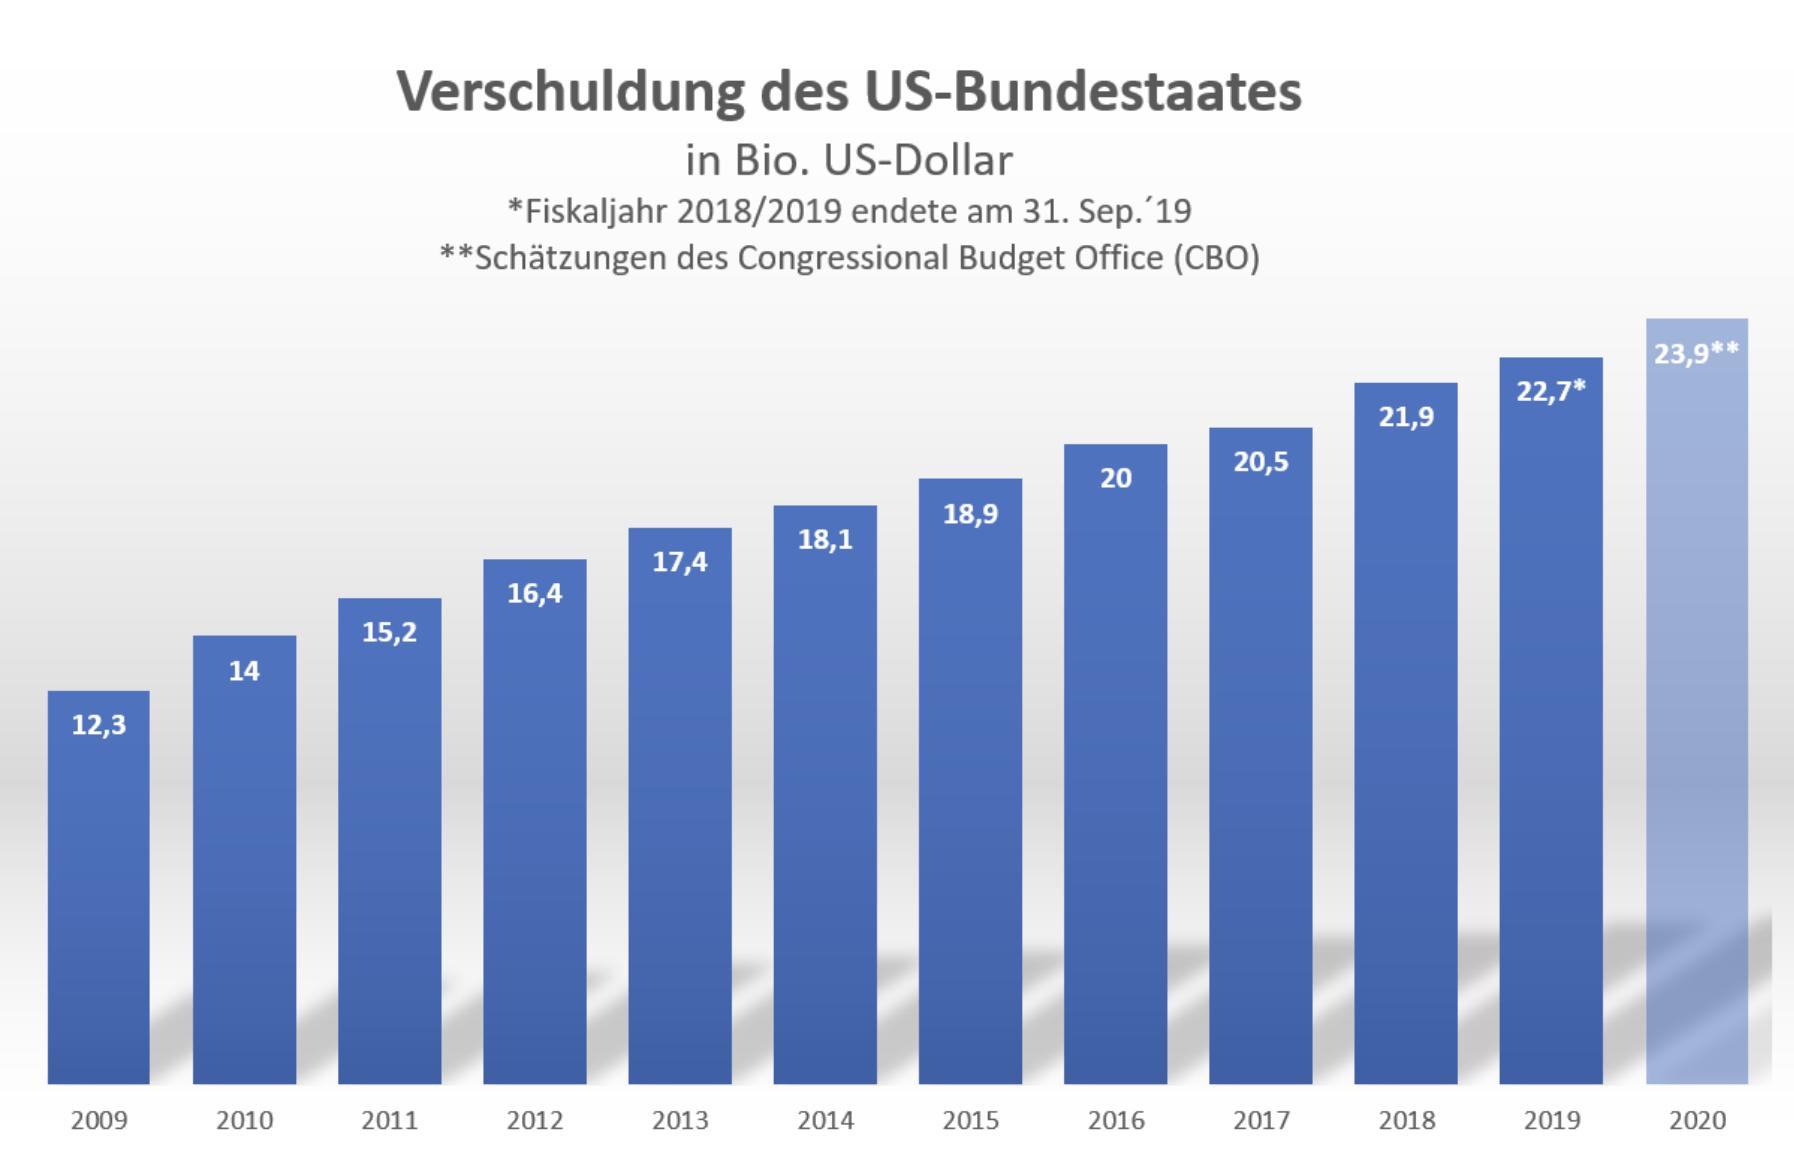 Verschuldung US-Bundeshaushalt